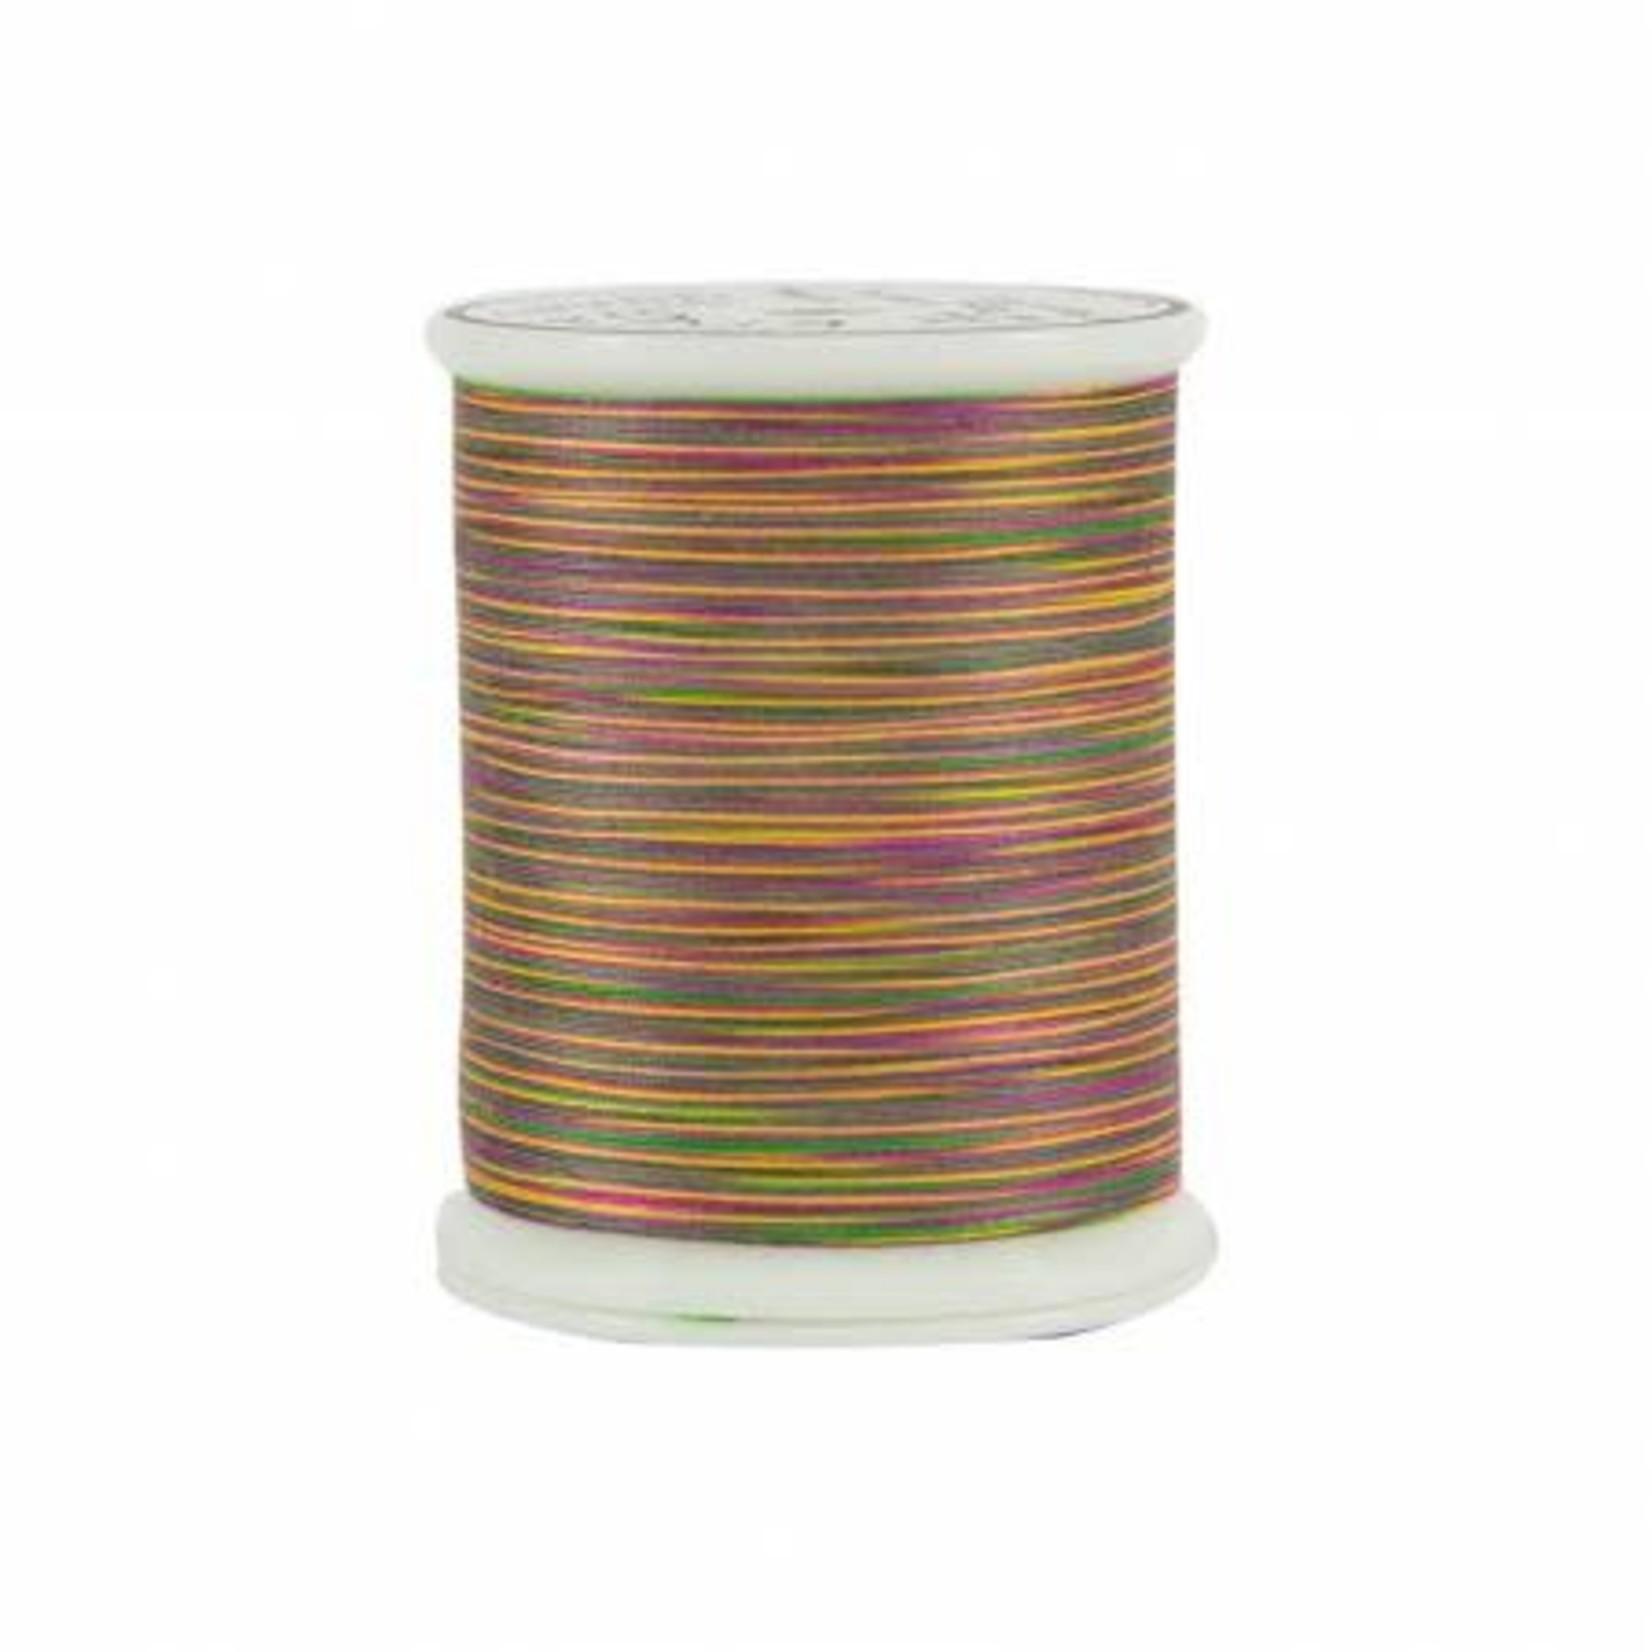 Superior Threads King Tut - #40 - 457 m - 0901 Neferti